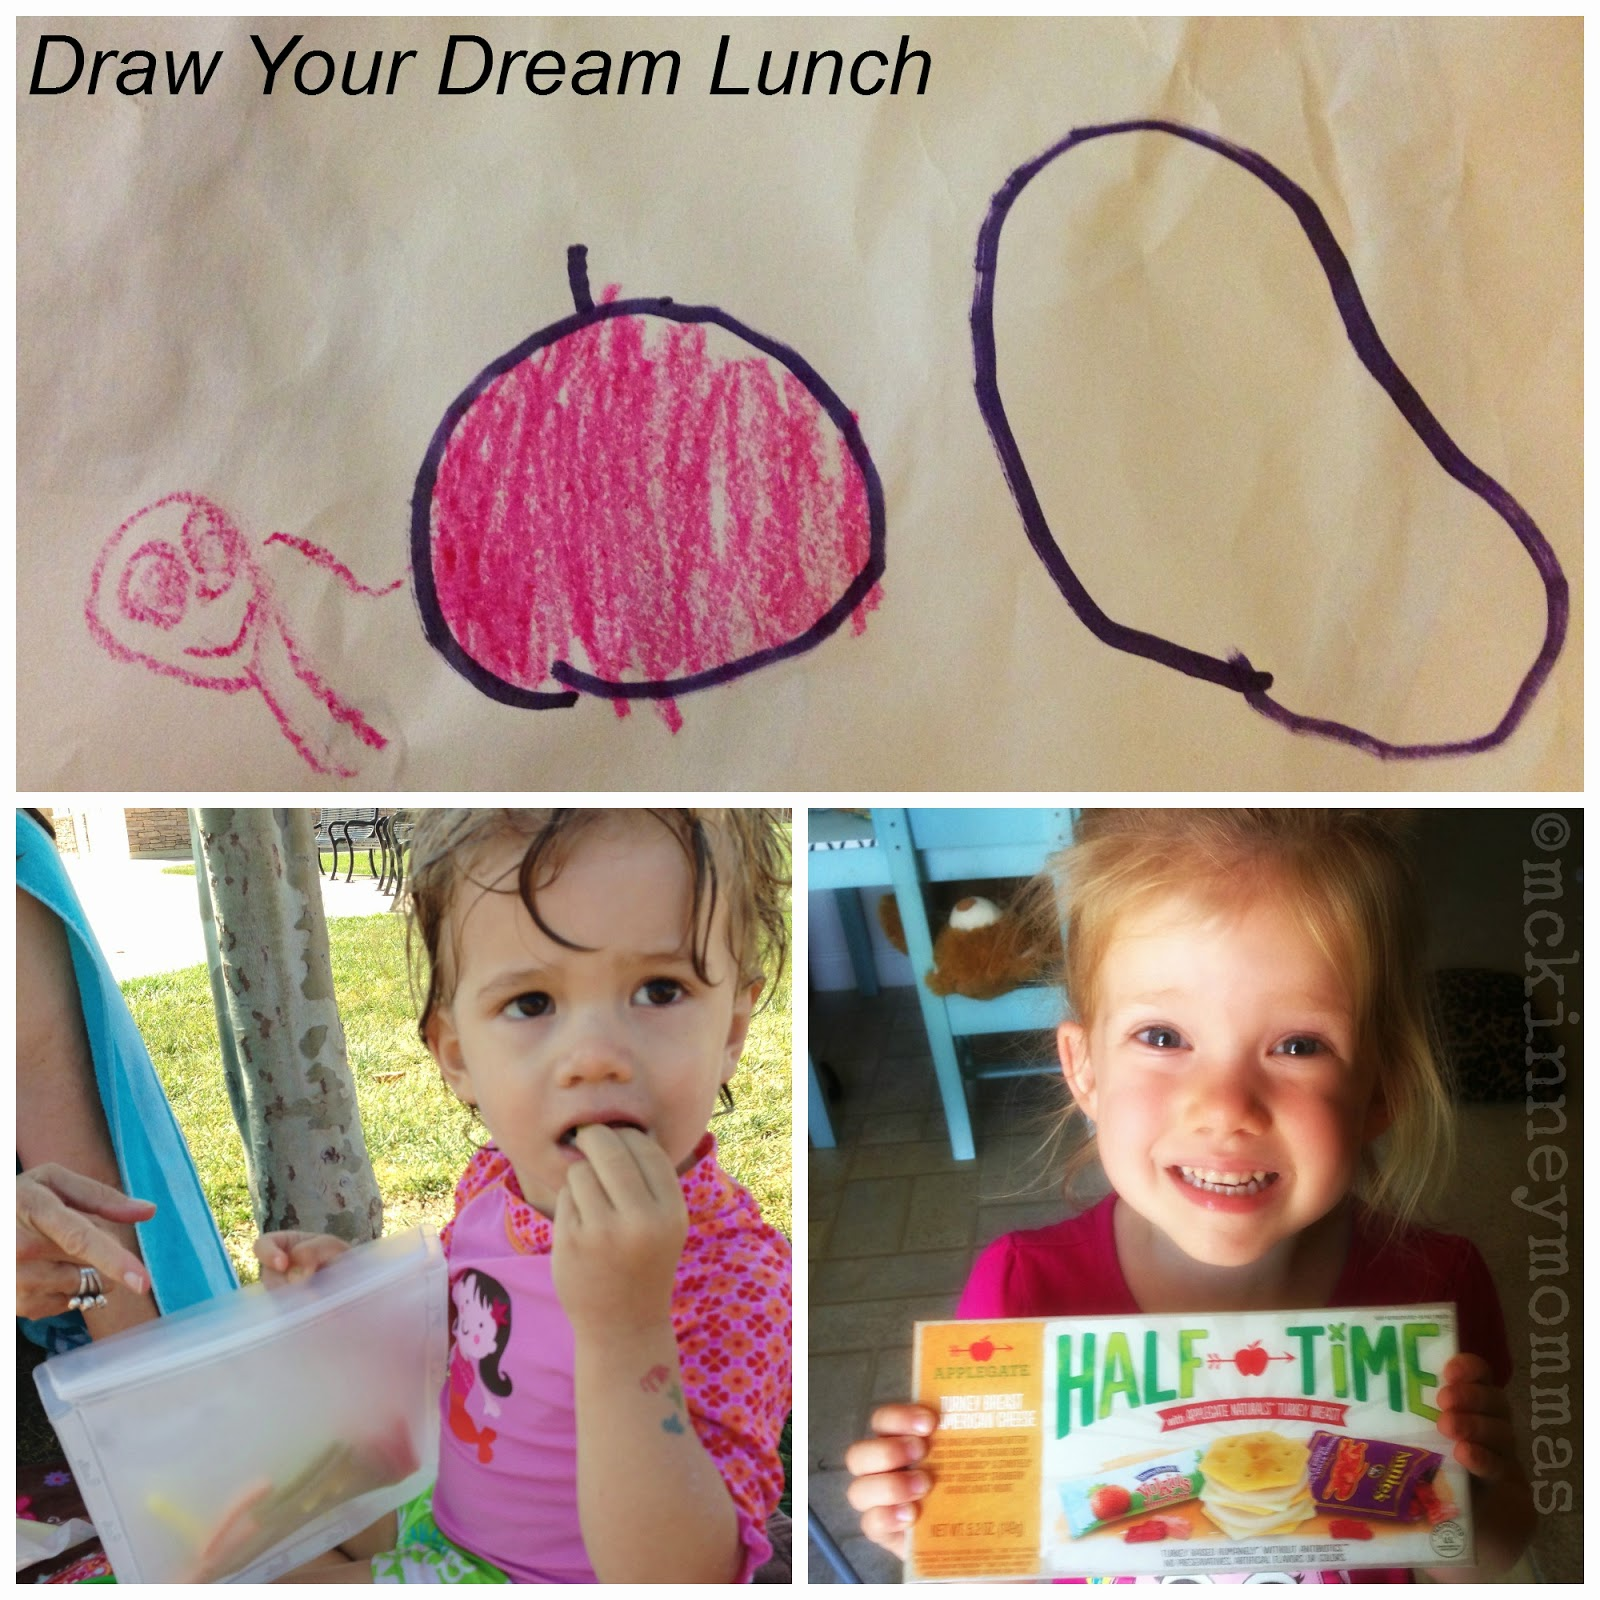 Annie's homegrown, Applegate Half Time Lunch Kit, Blue Avocado Rezip Bag